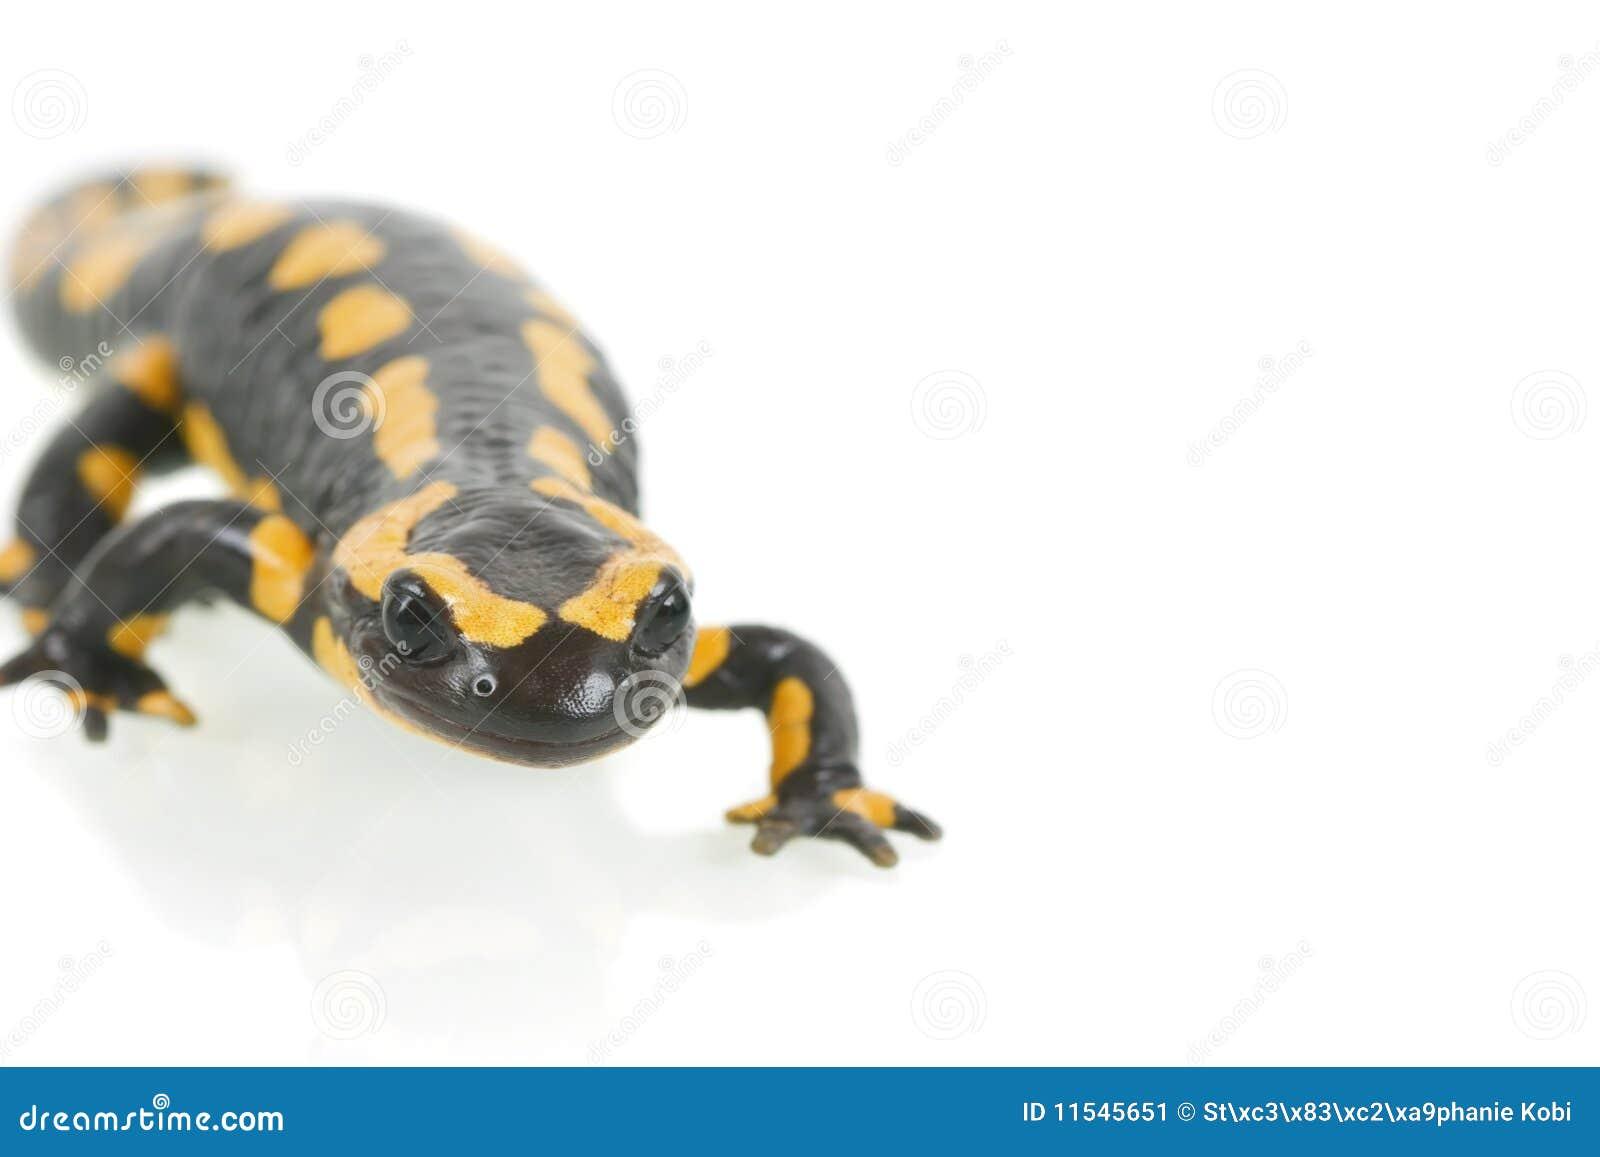 salamander white background - photo #38